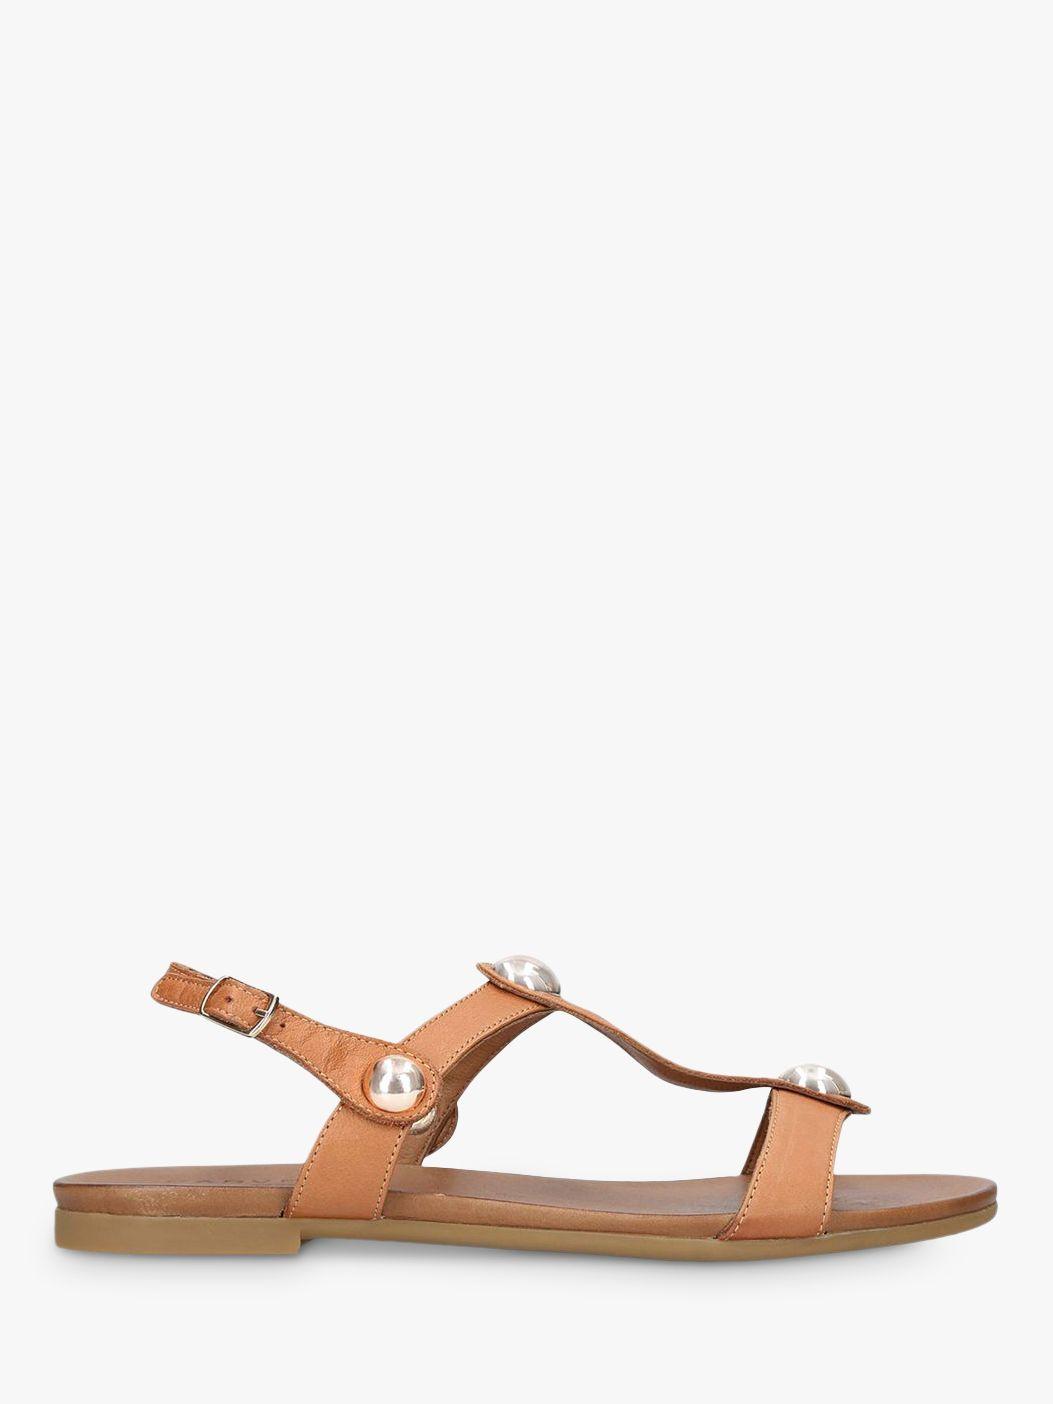 Carvela Comfort Carvela Comfort Saz Flat Open Toe Sandals